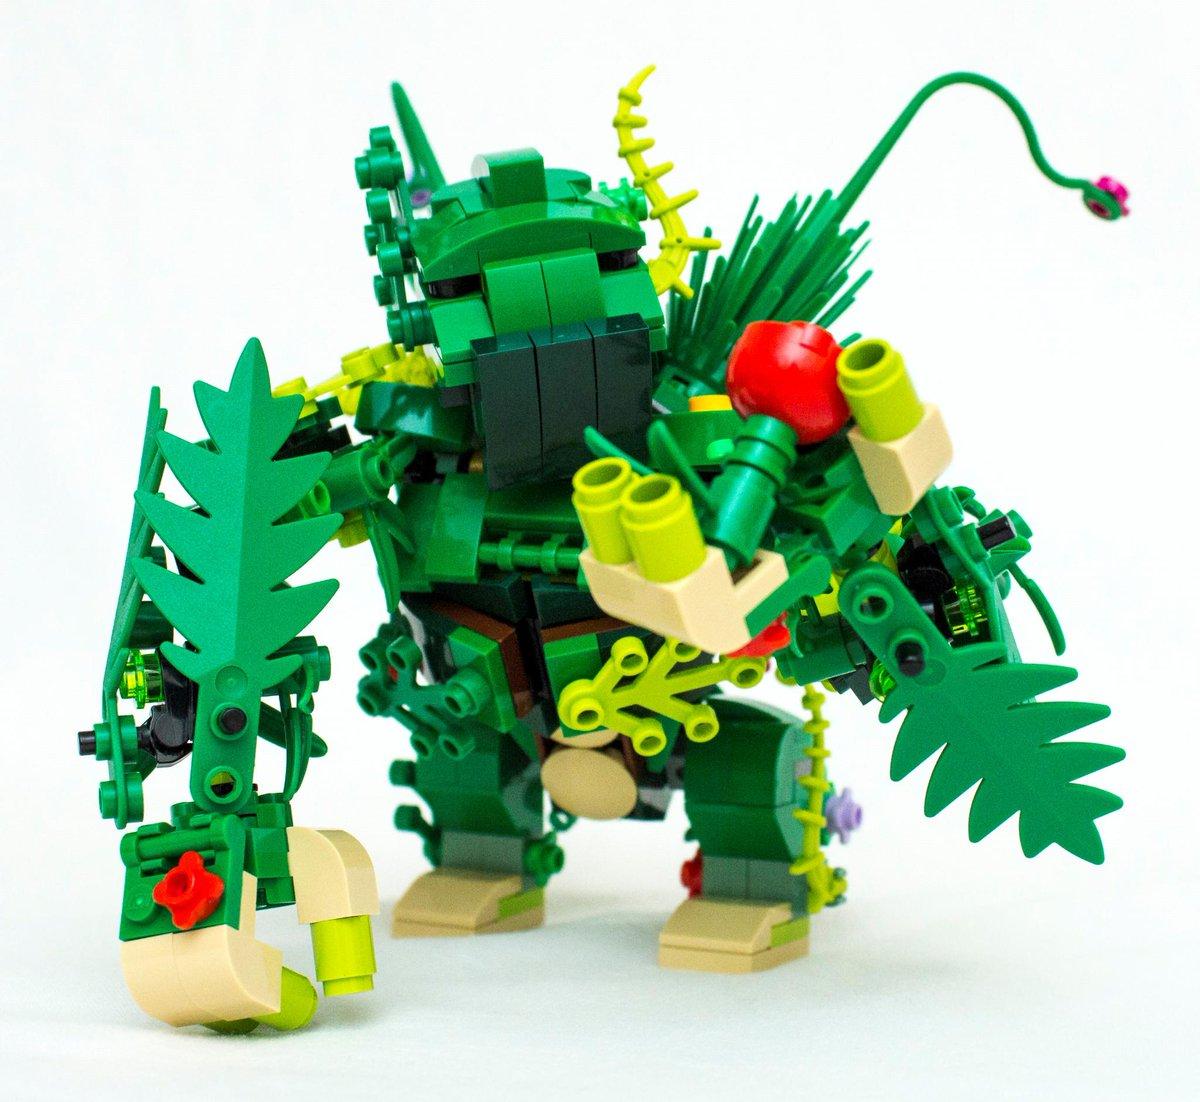 LEGO on Twitter: